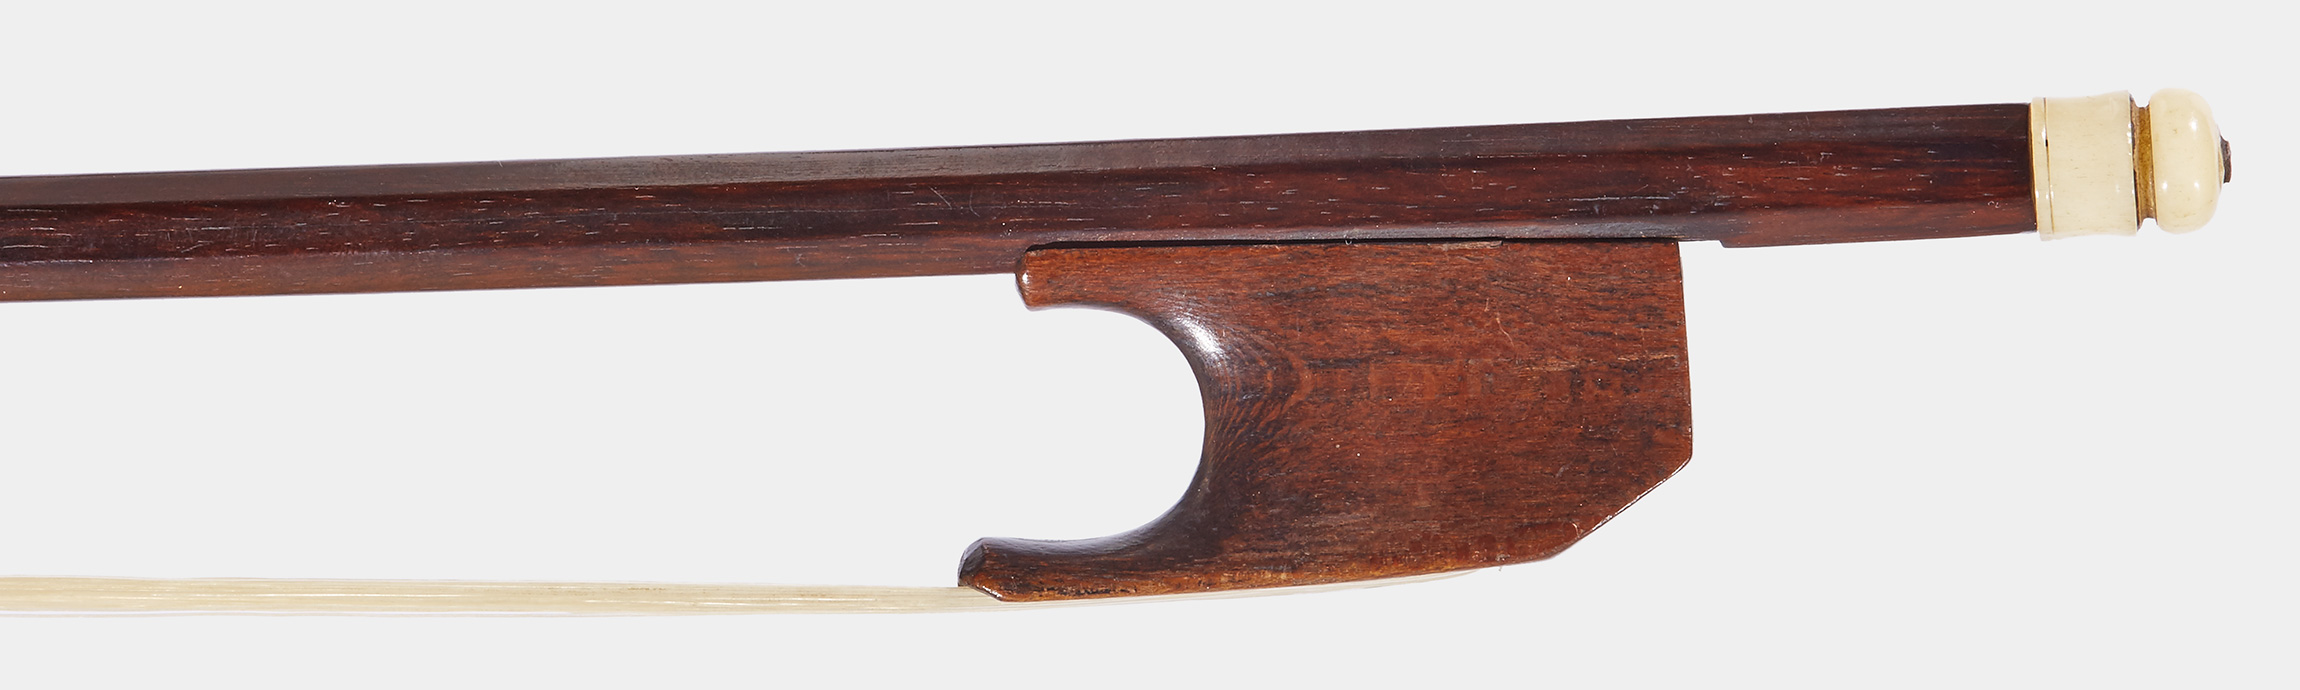 l75152frog